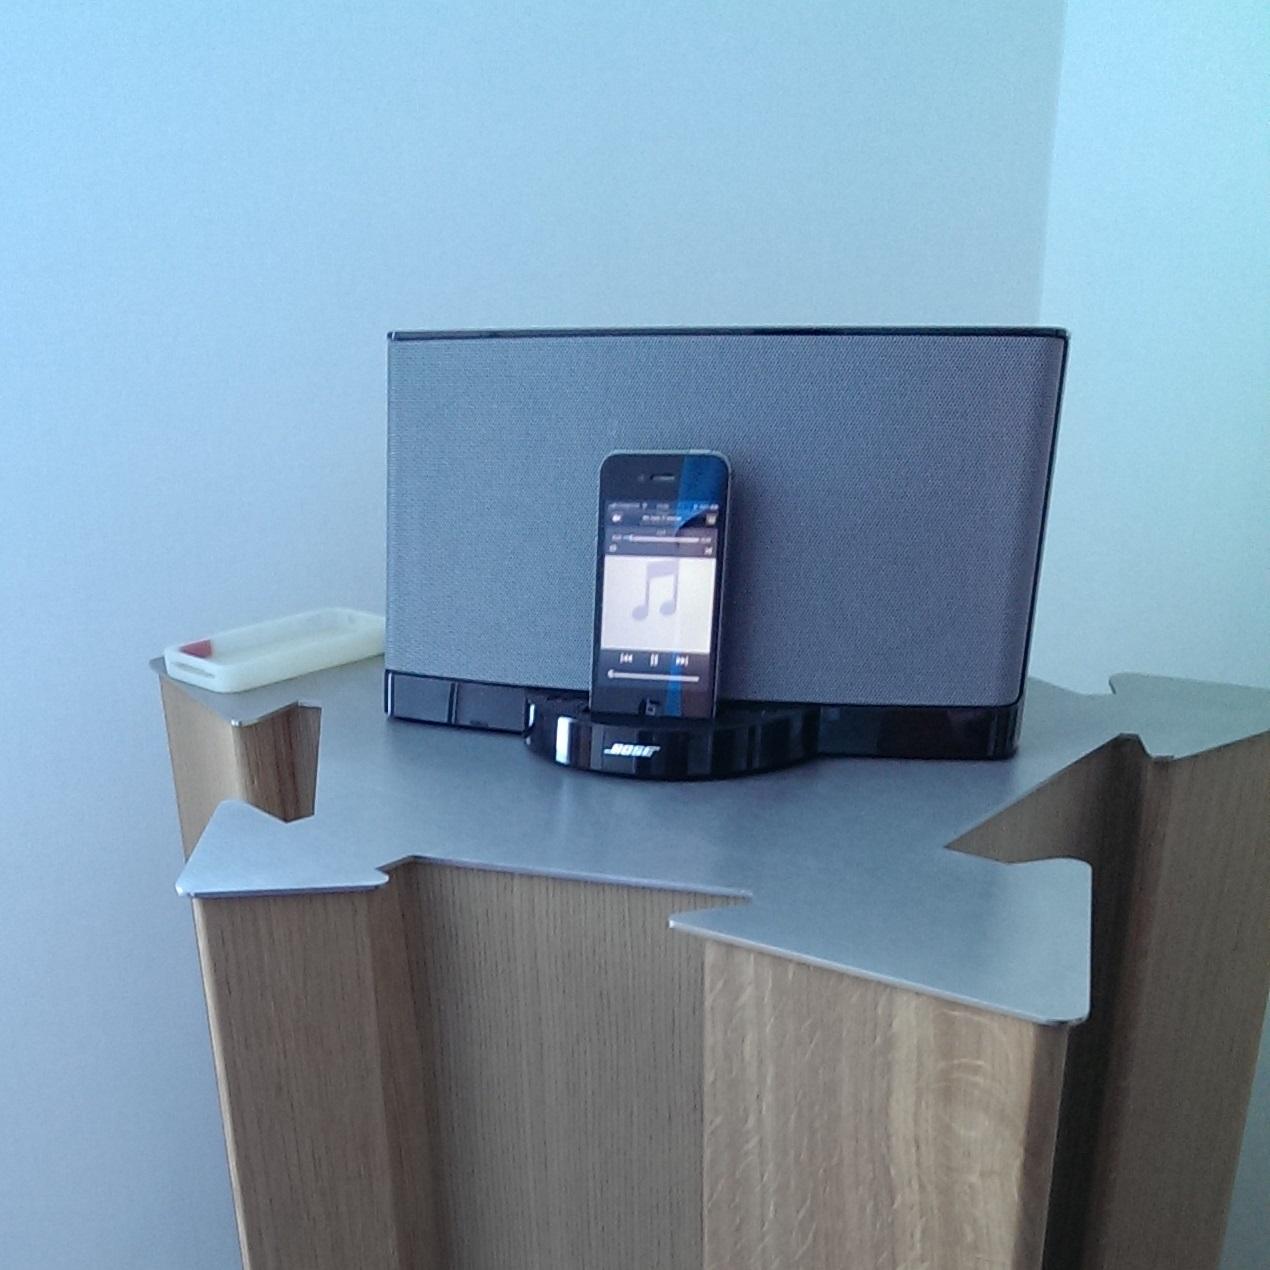 DoubleTree by Hilton Oradea Rumunia stacja dokujaca iPhone iPod